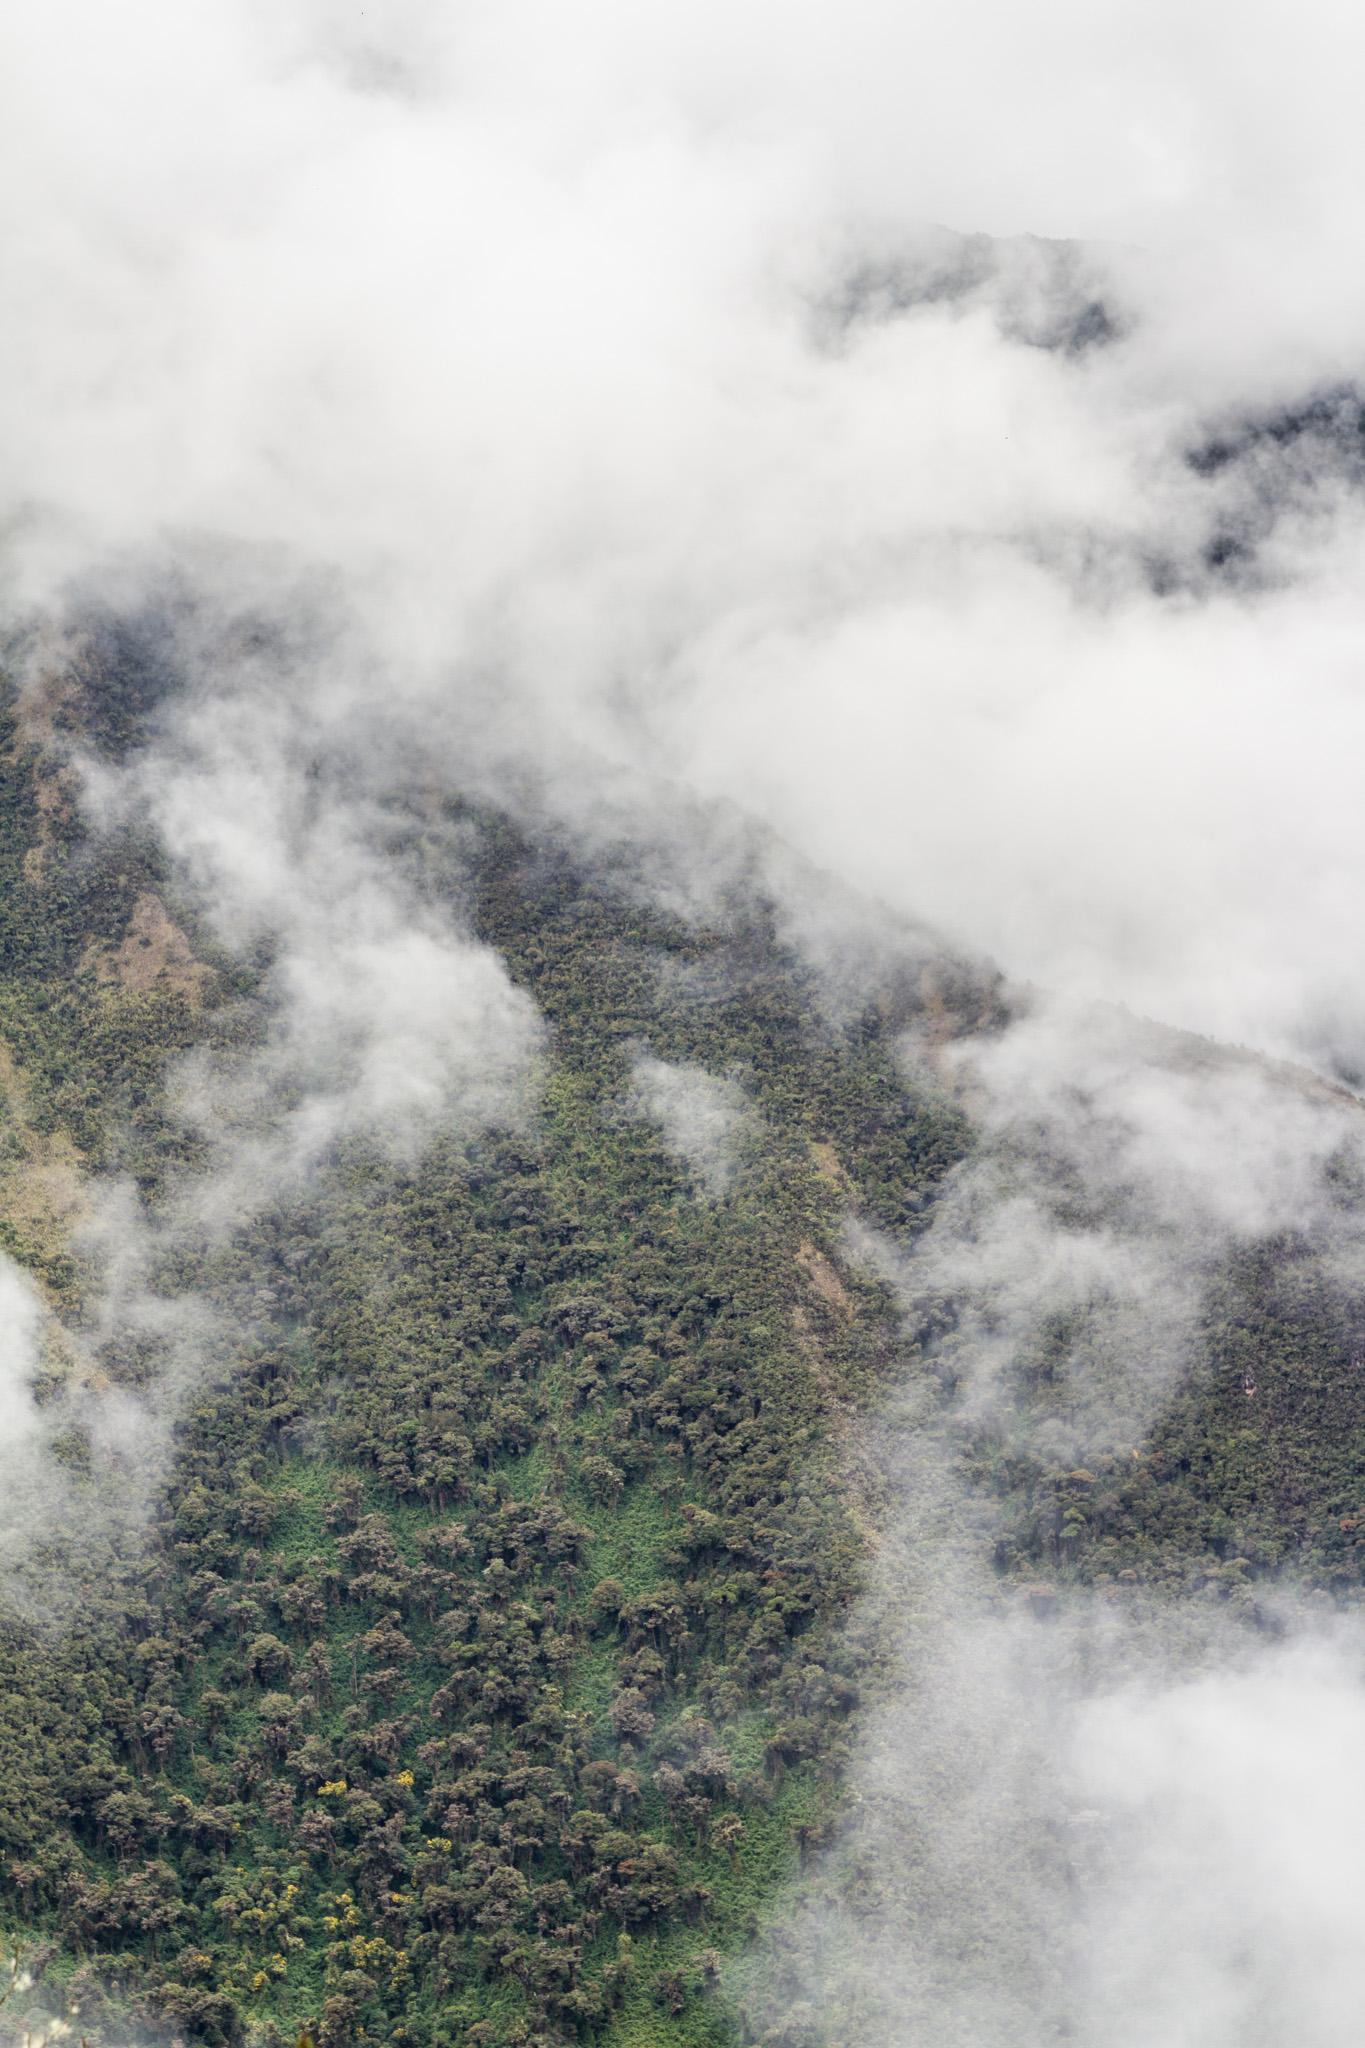 Ali-Barqawi-Studios-Explore-Series-Travel-Adventure-Documentary-C4CGAZA-Peru-MachuPicchu-2015-255.jpg